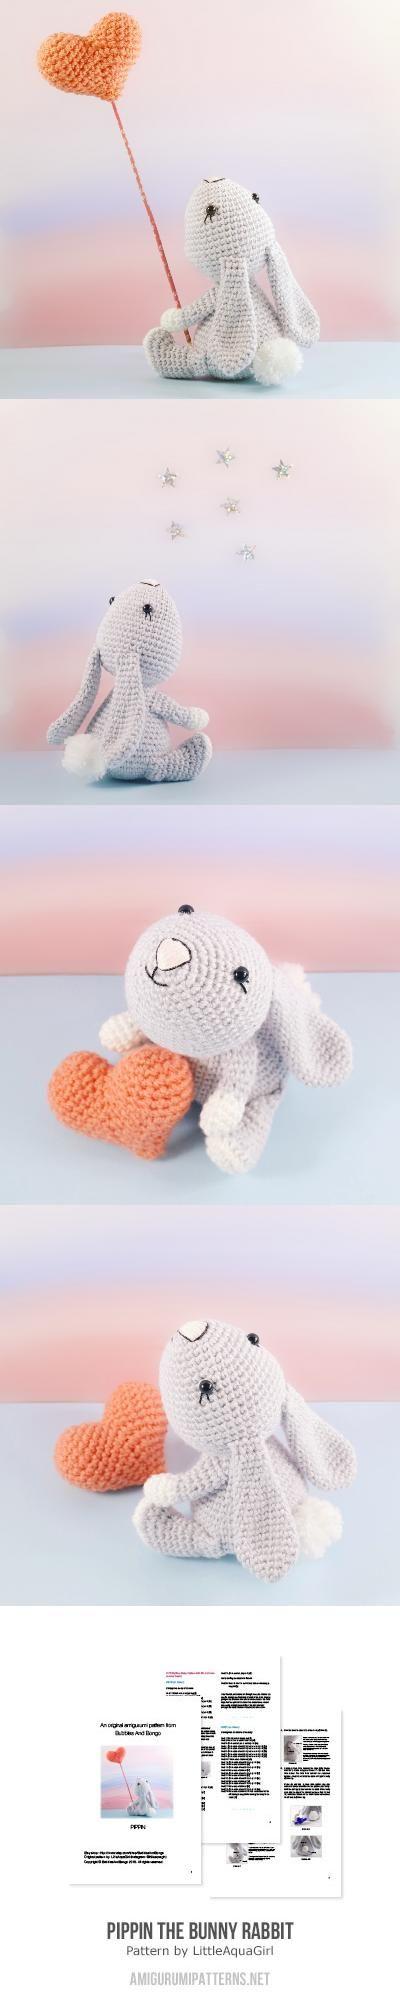 Pippin The Bunny Rabbit Amigurumi Pattern